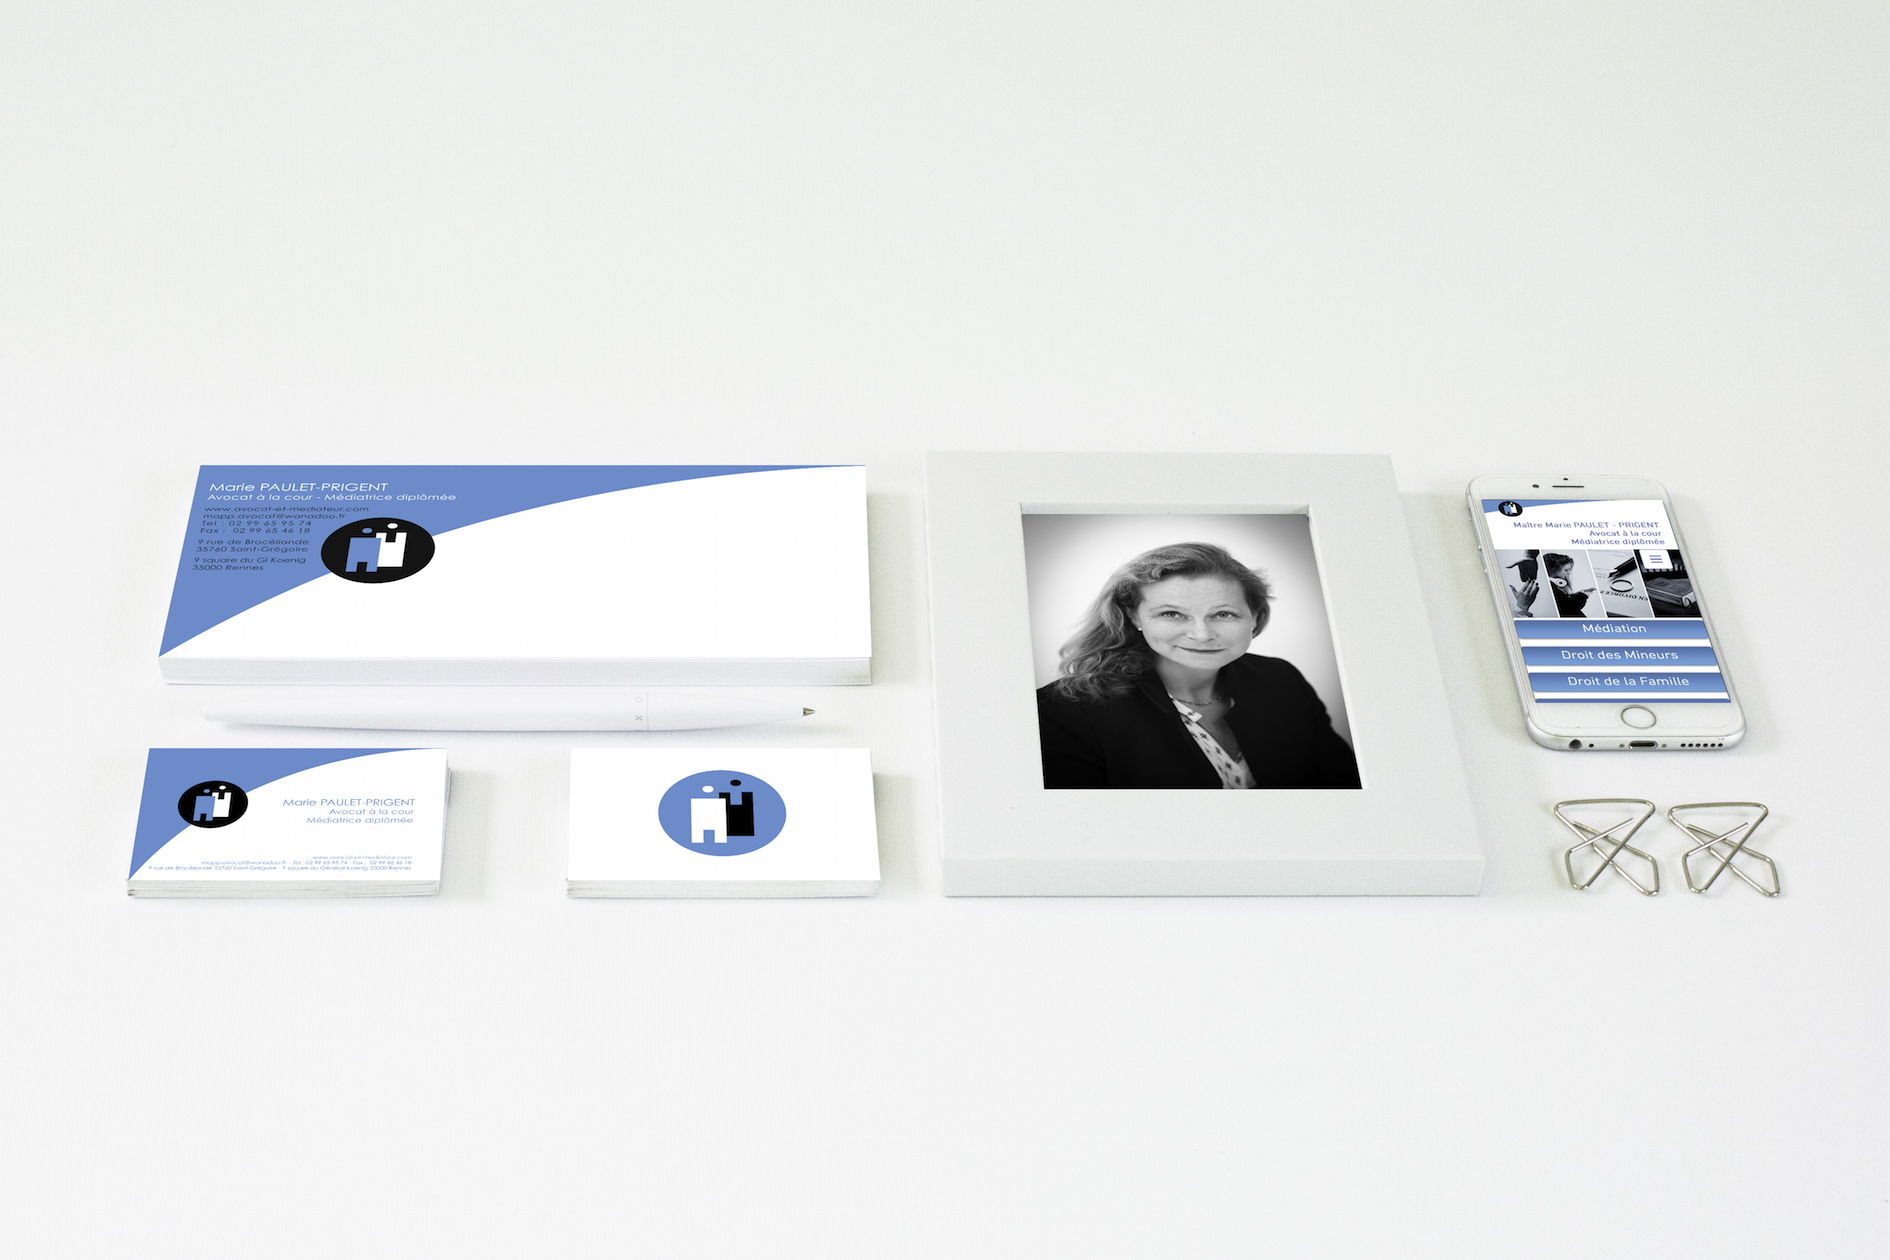 Marie Paulet-Prigent Avocate